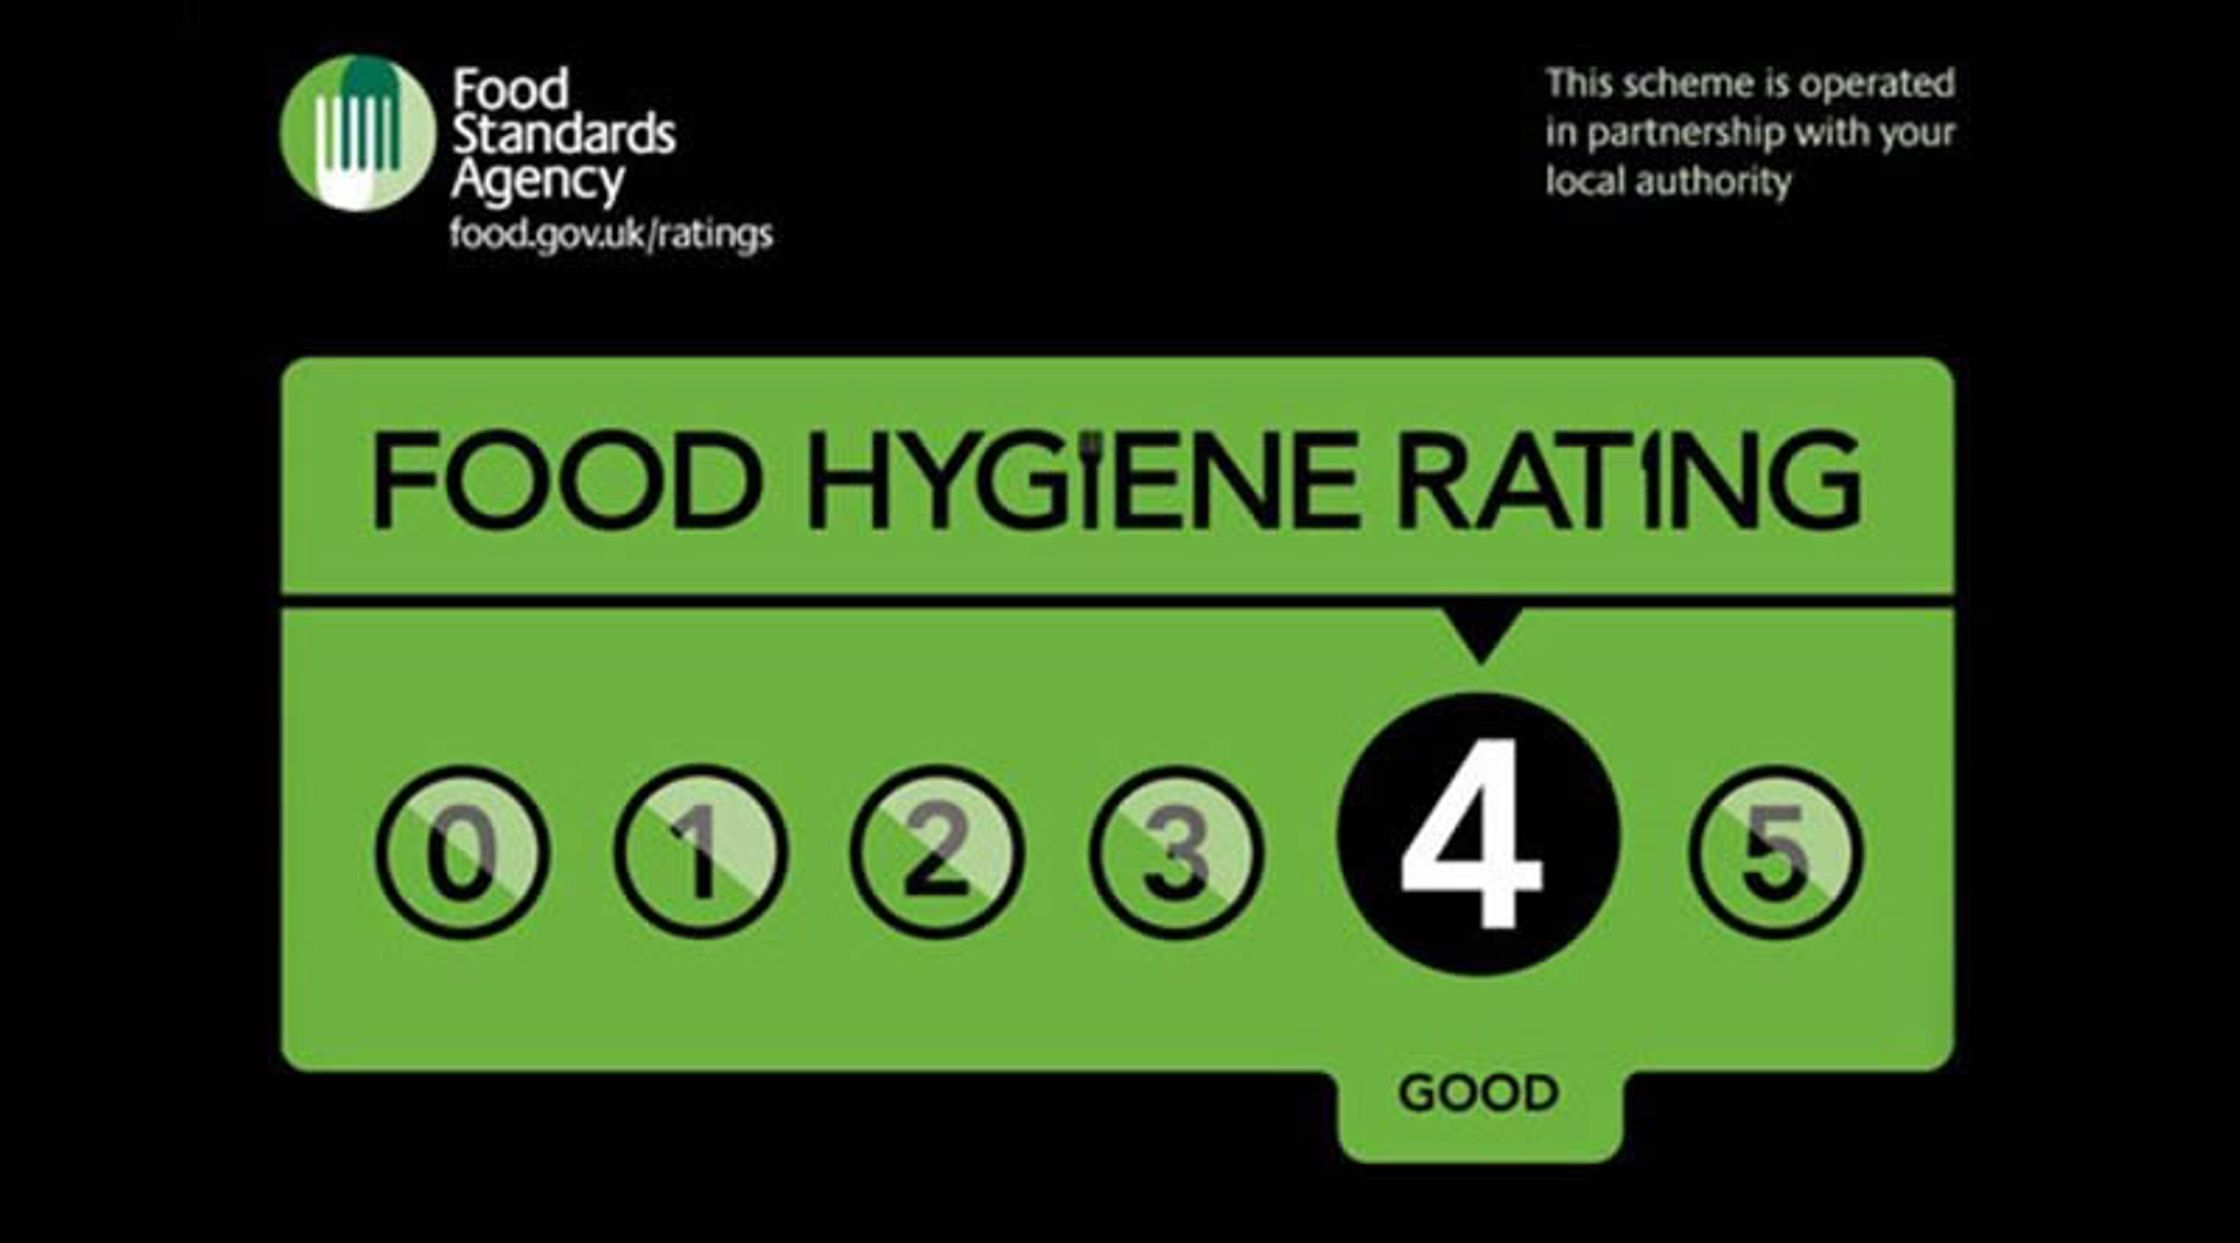 Food Hygiene Rating - Good